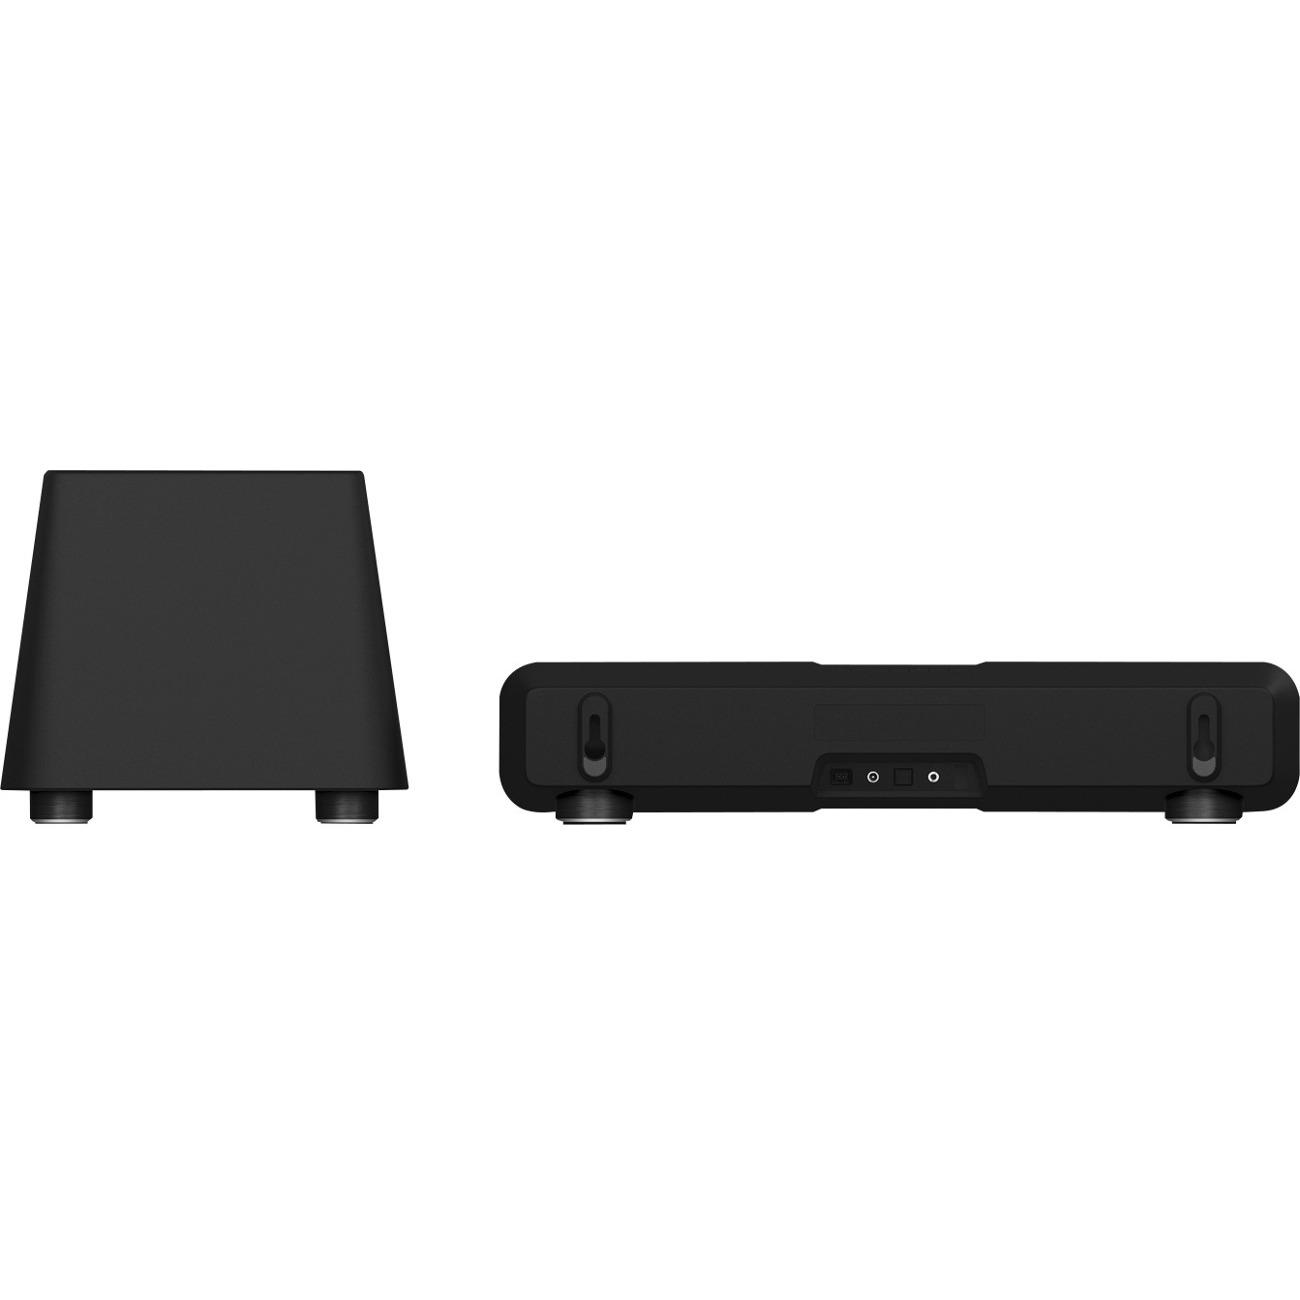 Razer Leviathan 5.1 Speaker System - 60 W RMS - Wireless Speaker(s) - Black - 20 Hz - 20 kHz - 32.8 ft - Dolby Digital, Dolby Virtual Speaker, Dolby Pro Logic II - Bluetooth 2